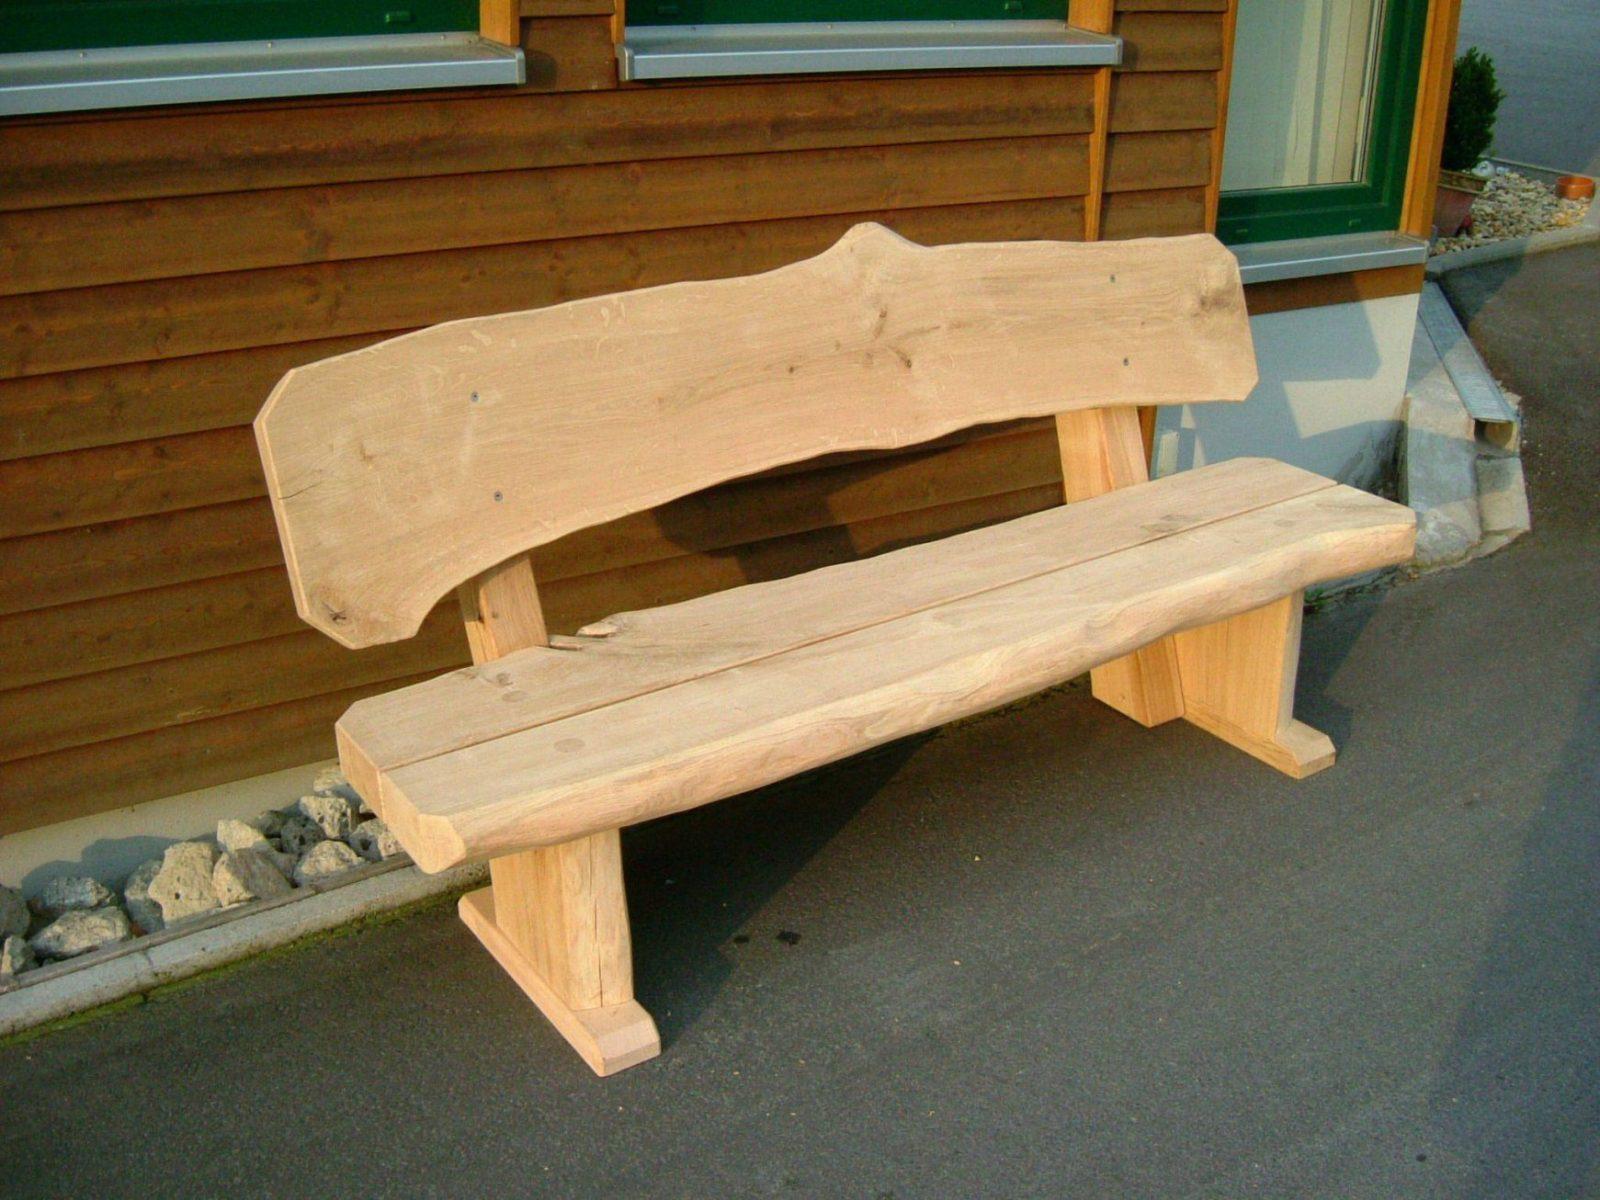 Gartenbank Holz Massiv Rustikal Exquisit Rustikale Gartenmabel Von von Rustikale Gartenbank Selber Bauen Bild